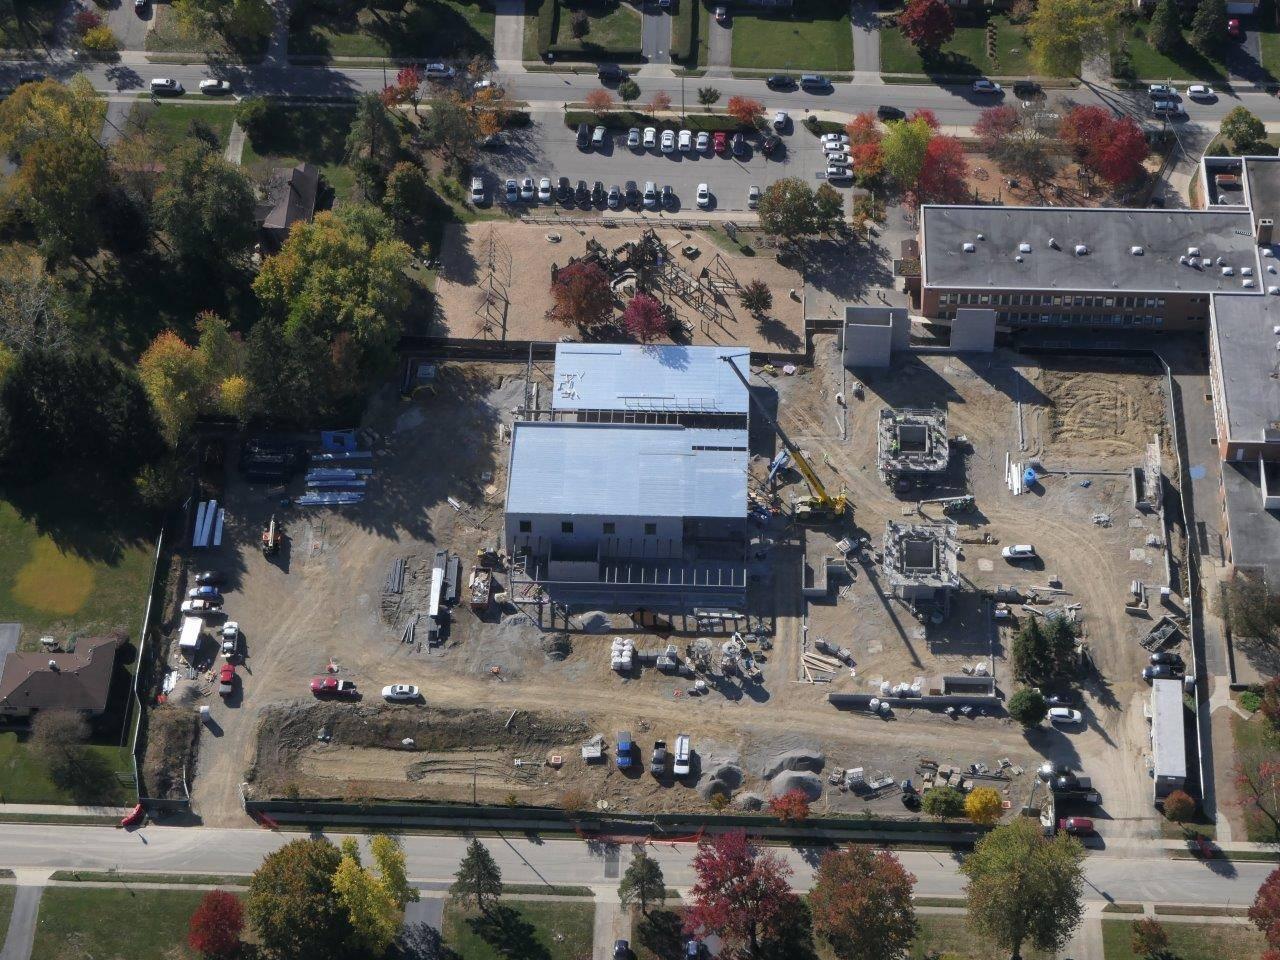 Aerial photo of the Wickliffe Progressive Elementary School site